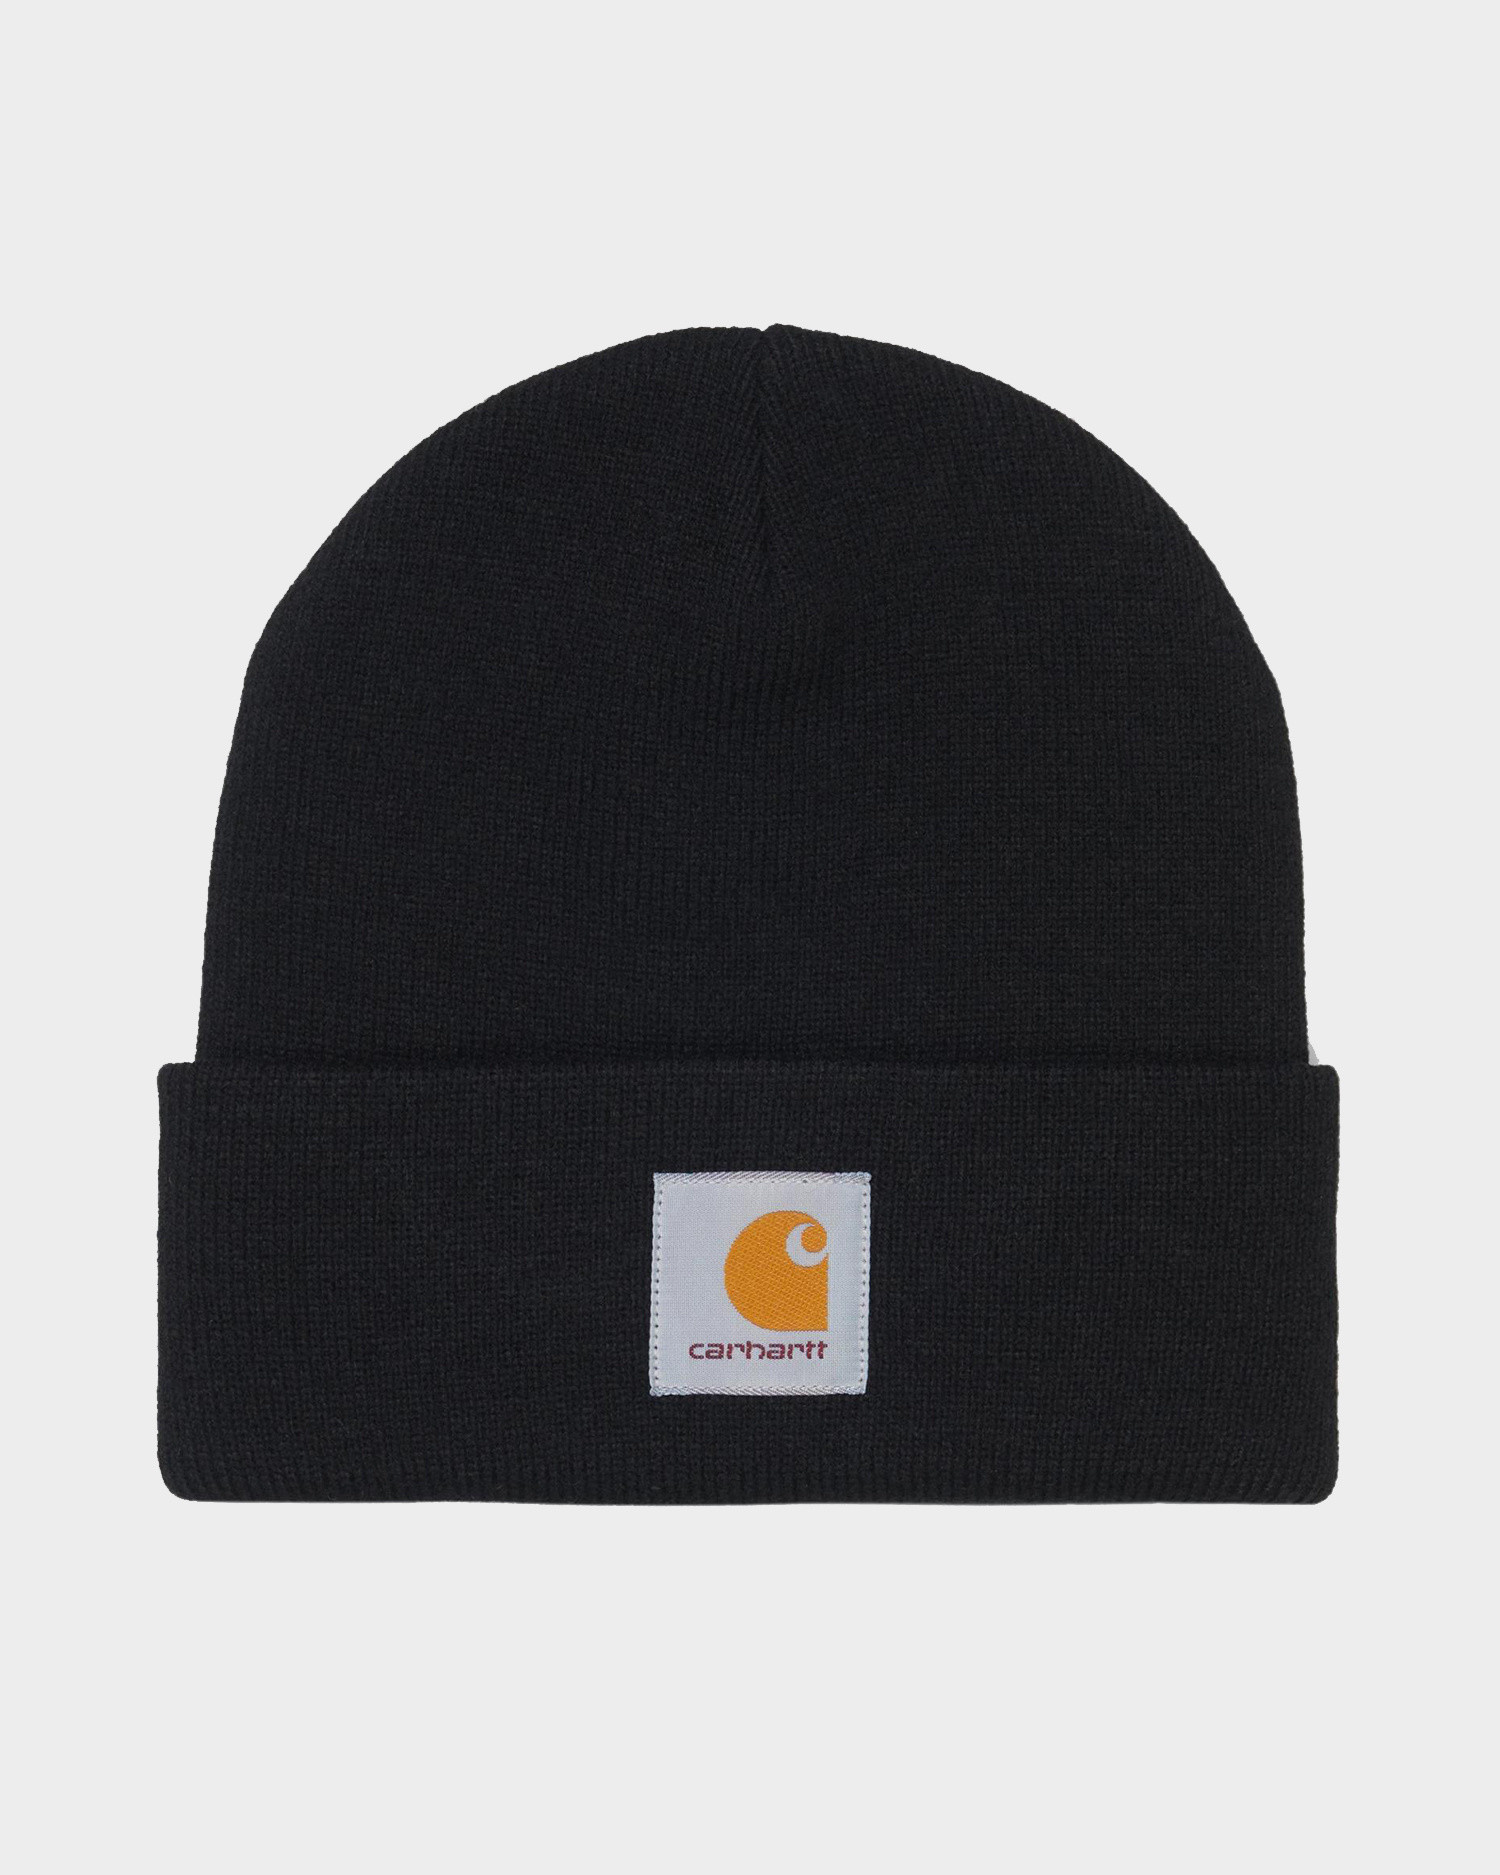 Carhartt Short Watch Hat Black